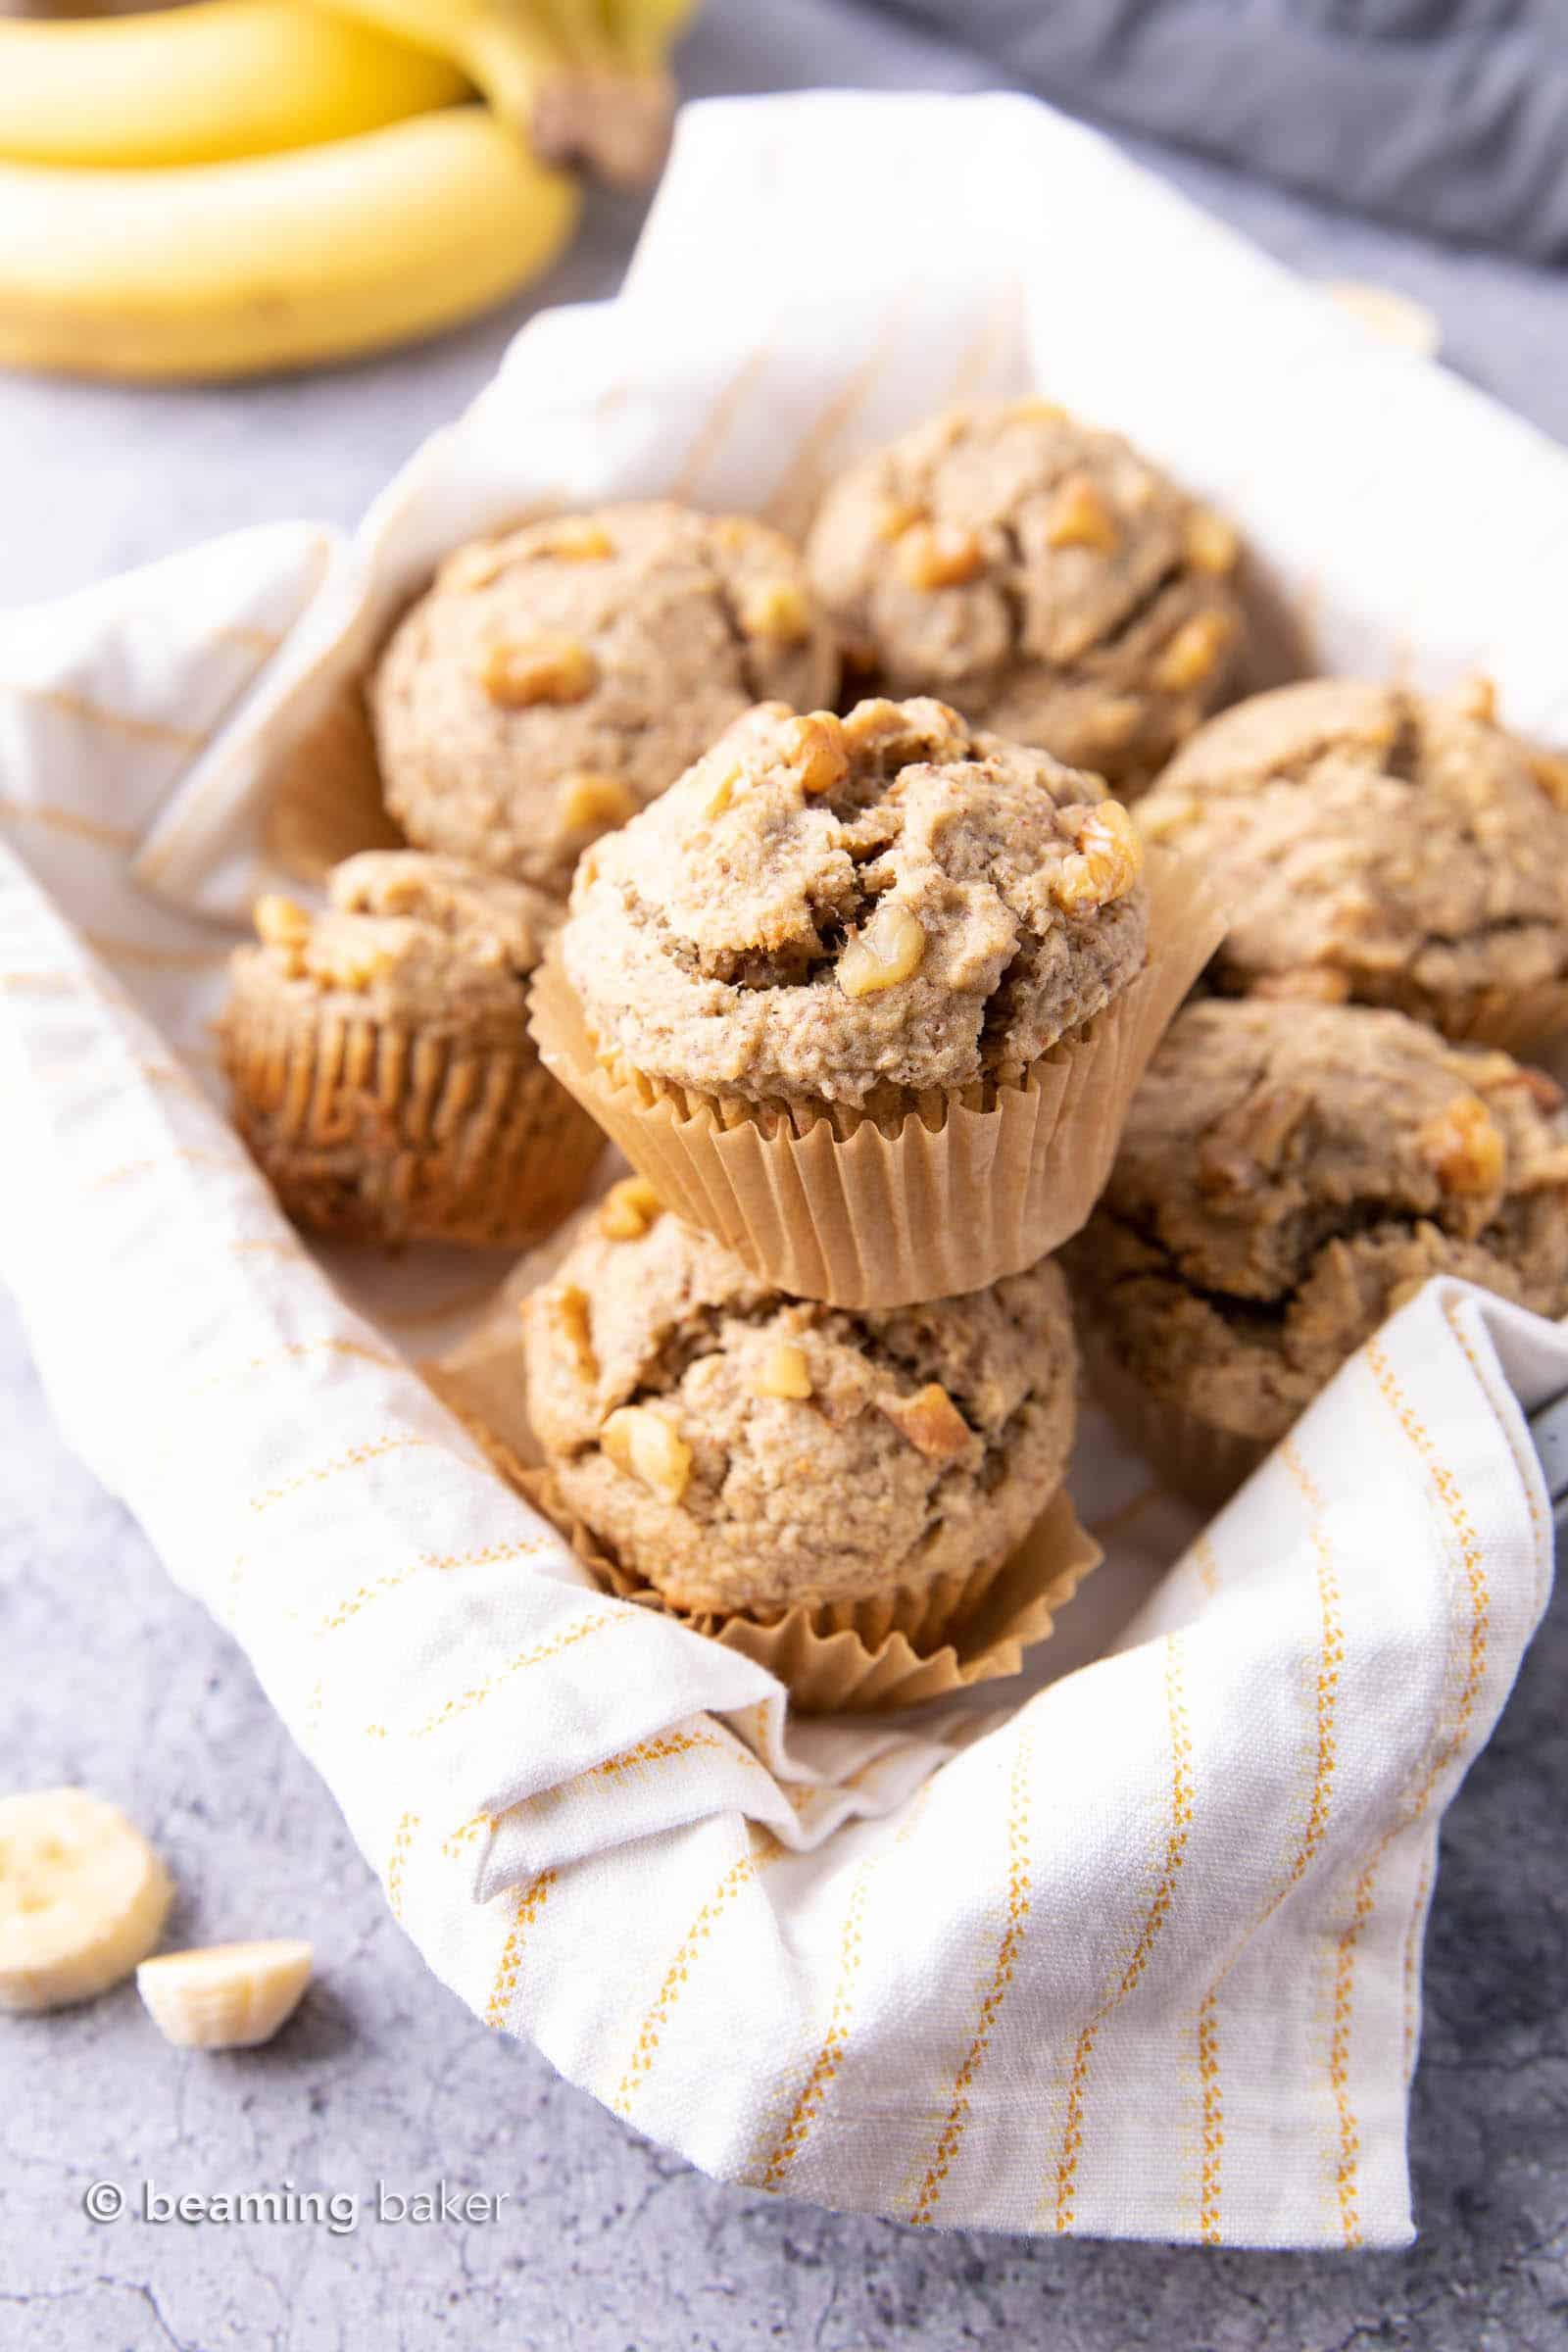 Vegan Banana Muffins Recipe: soft 'n moist vegan banana bread muffins with a satisfying texture and big banana flavor! #Vegan #Banana #Muffins #DairyFree | Recipe at BeamingBaker.com